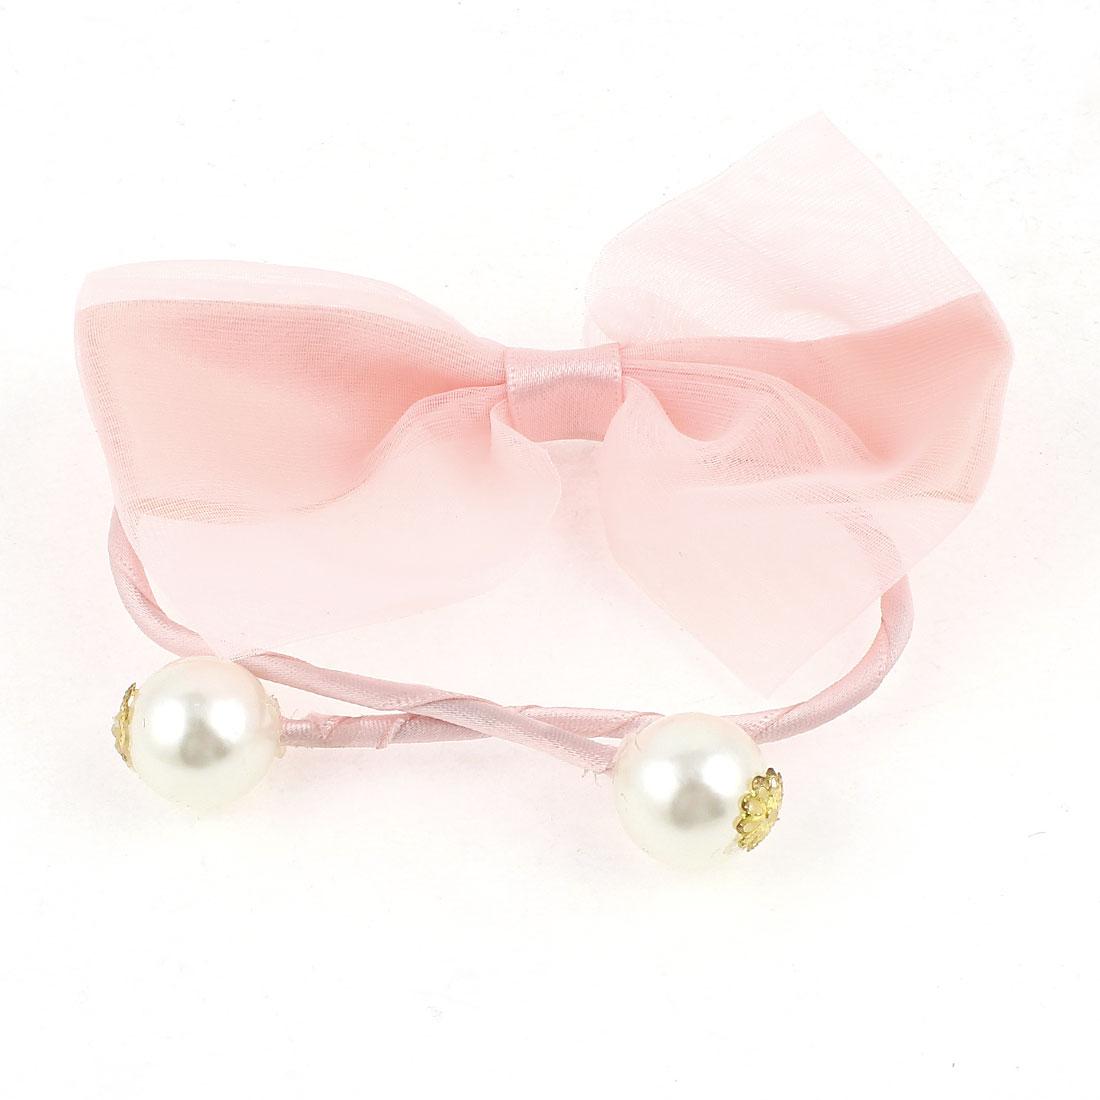 Women Imitation Pearl Bowtie Accent DIY Wire Hair Band Tie Wrap Peachpuff